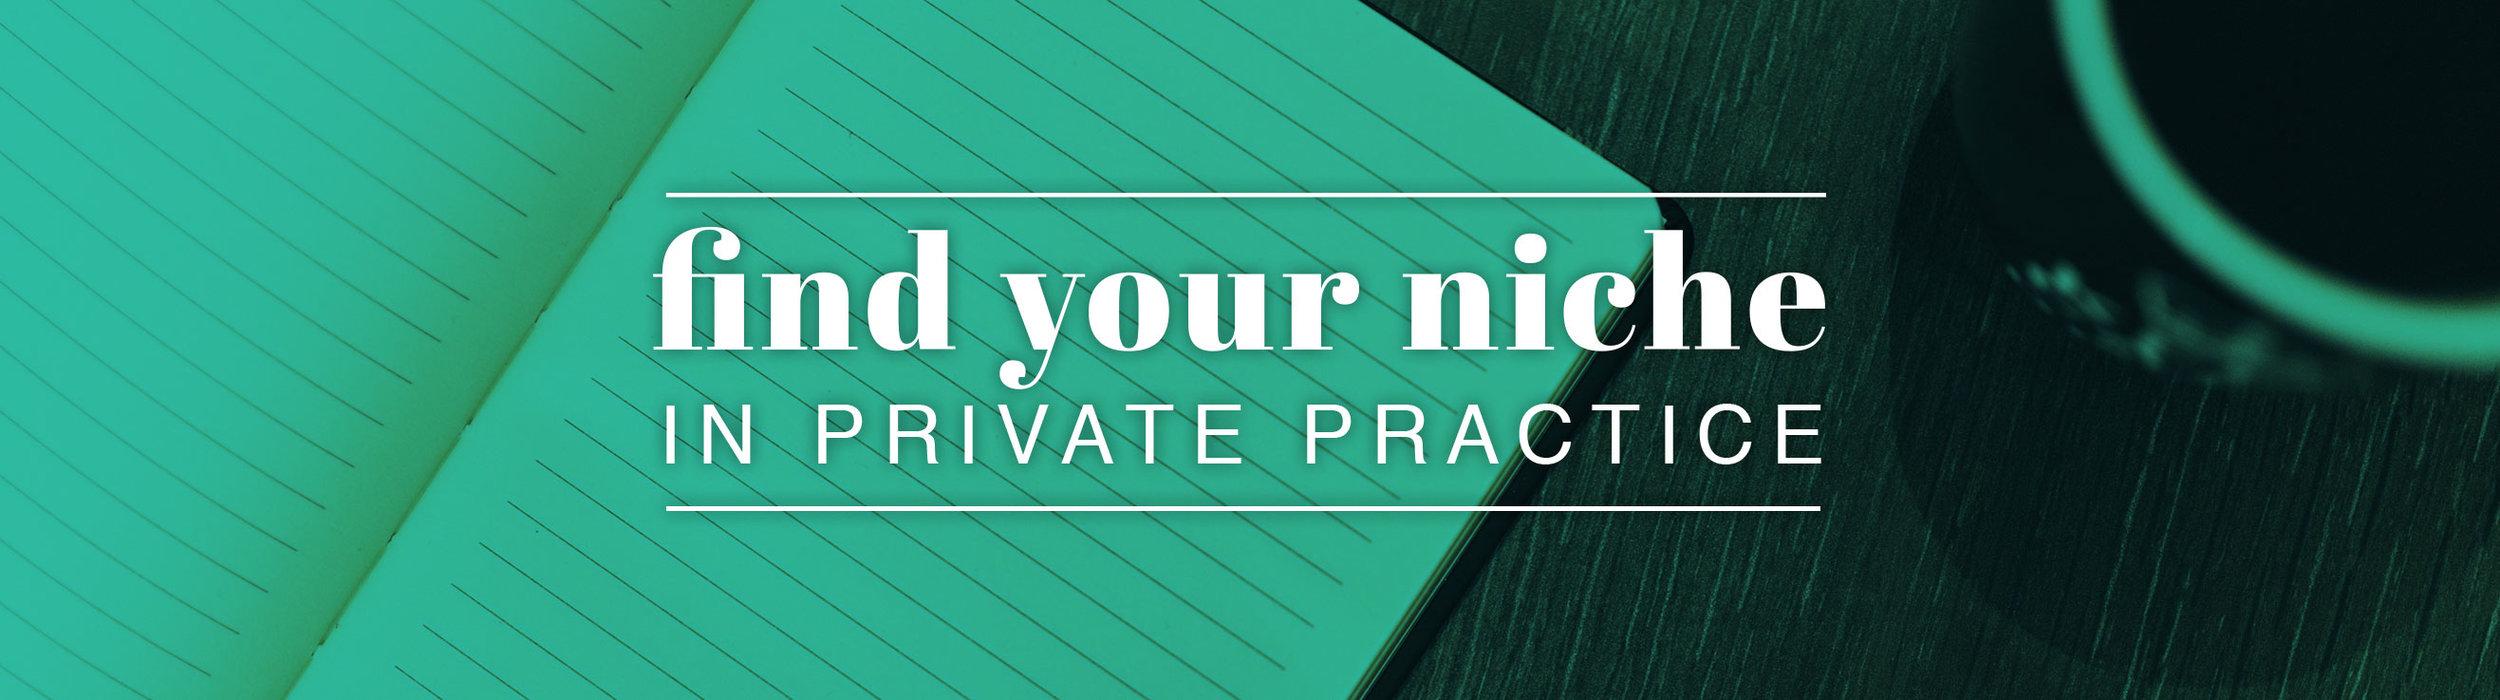 find private practice niche.jpg